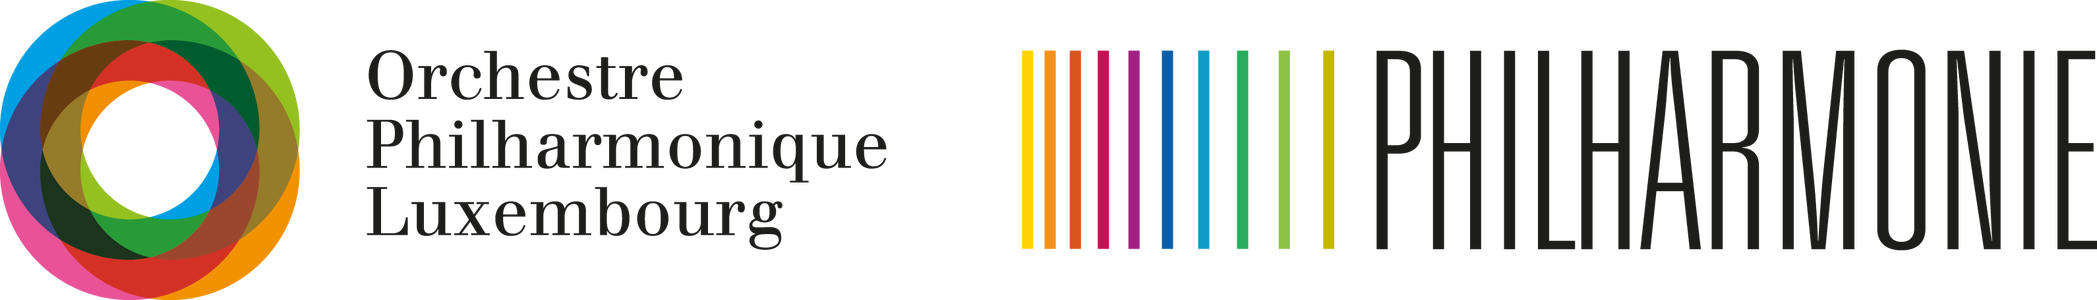 Editor in Chief - Philharmonie Luxemburg - Logo